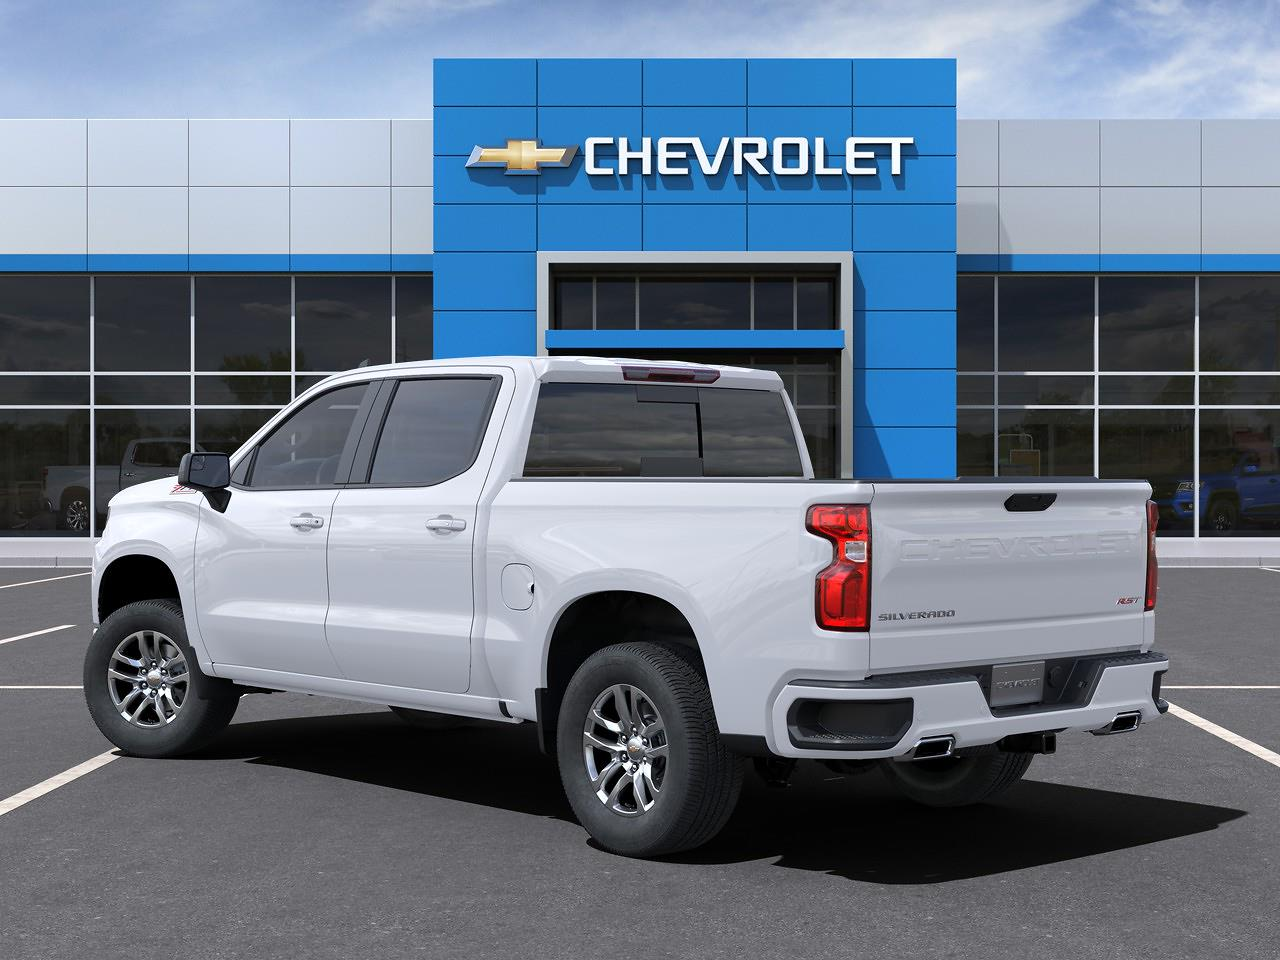 2021 Chevrolet Silverado 1500 Crew Cab 4x4, Pickup #Q210143 - photo 2